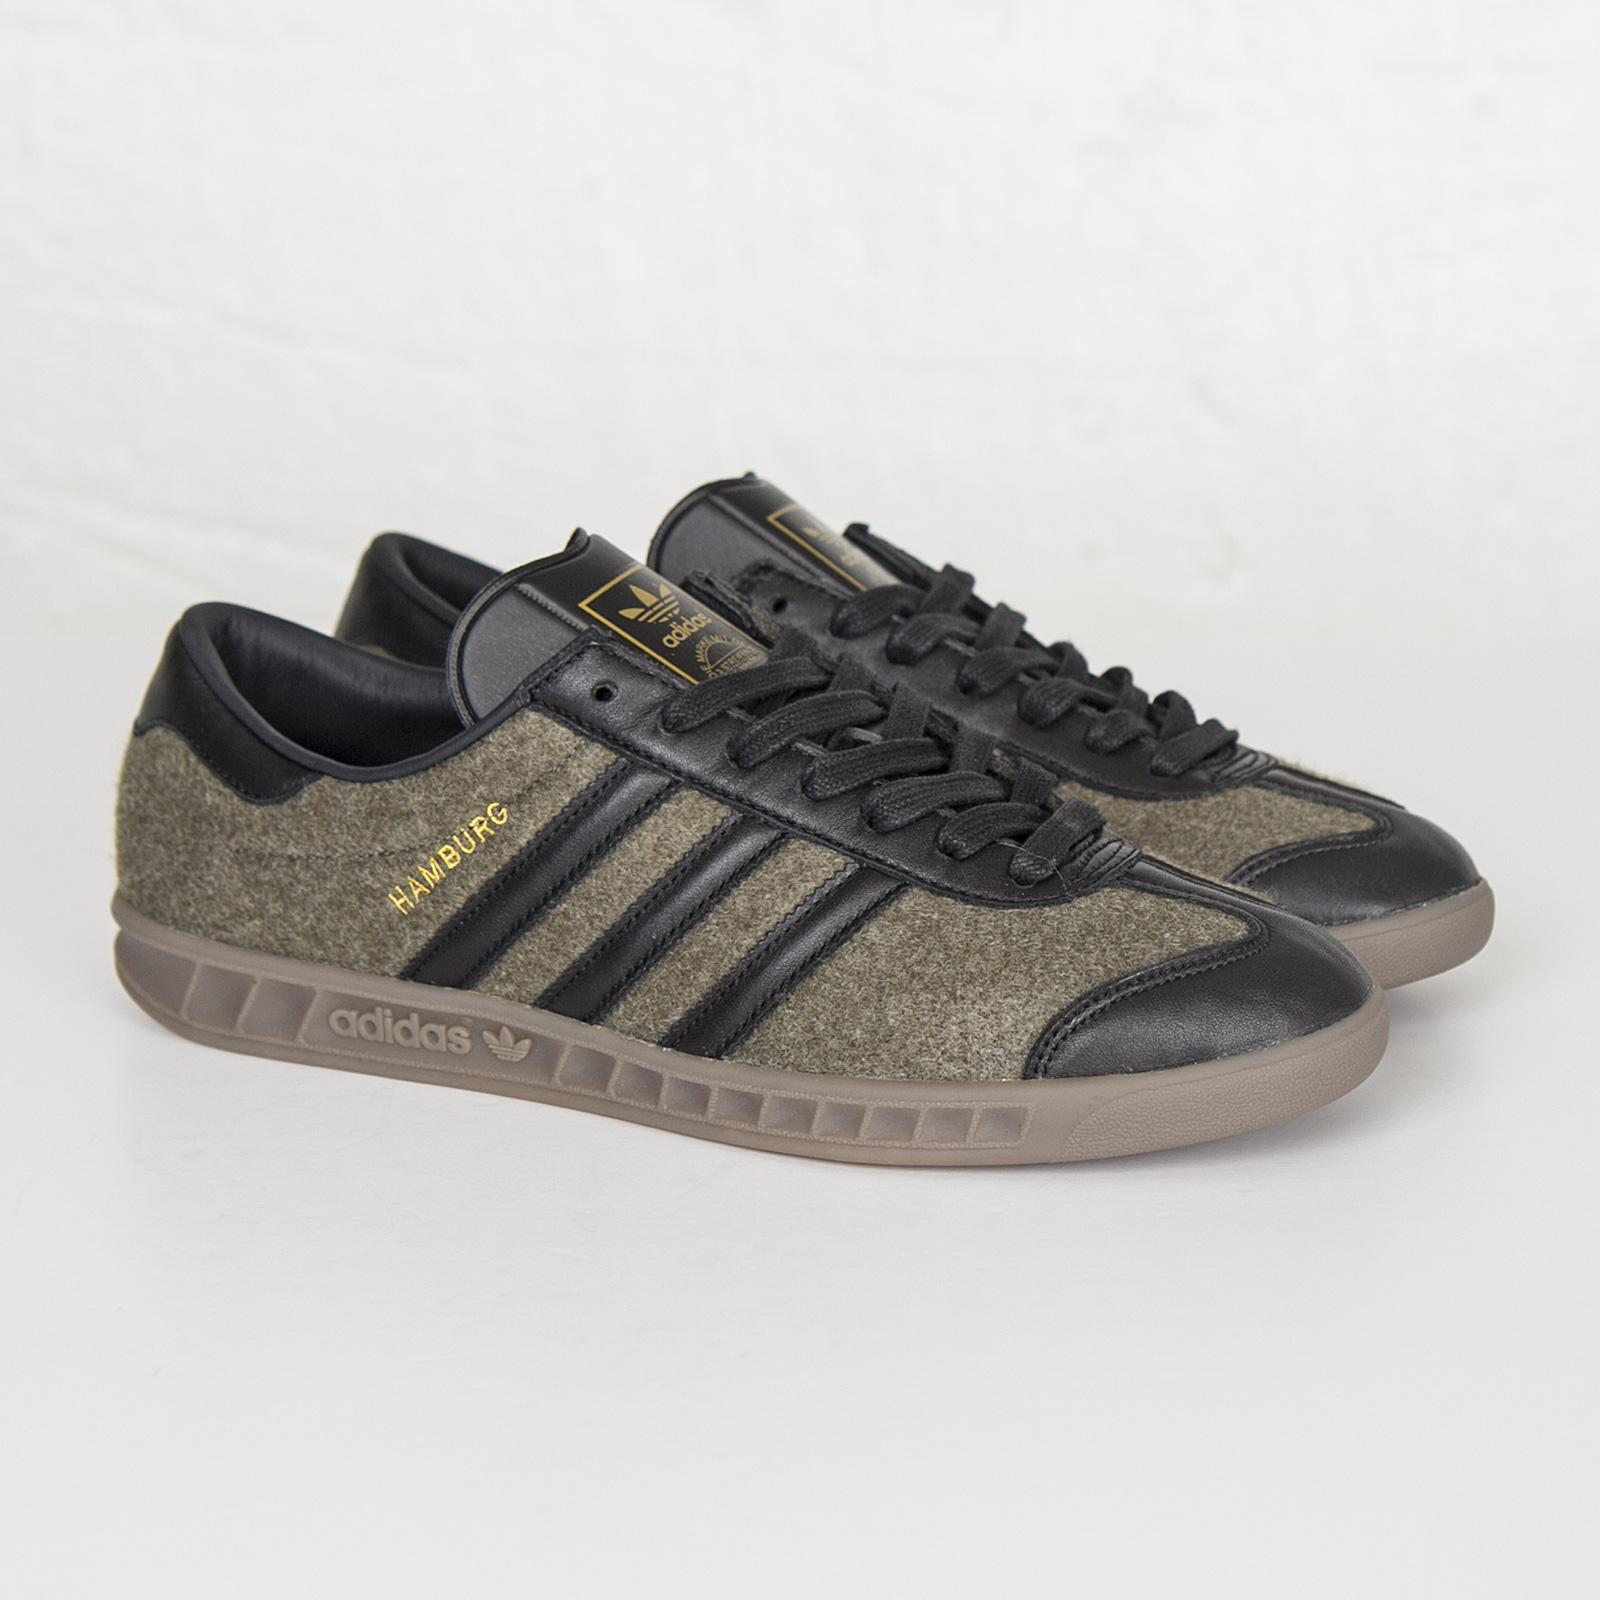 promo code 93264 e8971 adidas Hamburg - B24970 - Sneakersnstuff  sneakers  streetwe